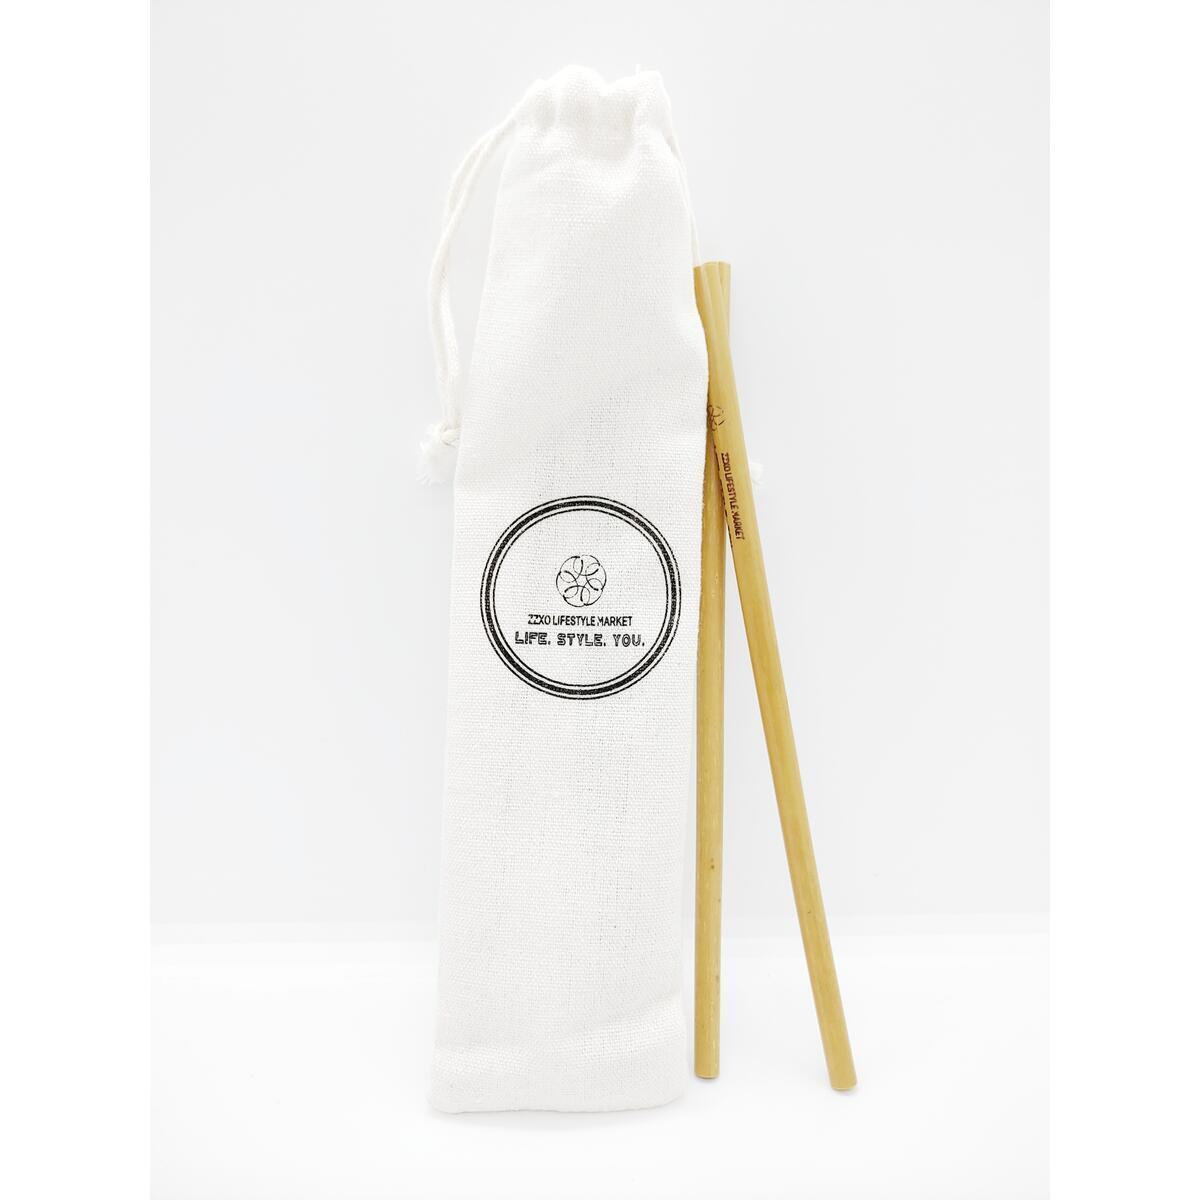 Eco Friendly - Reusable - Bamboo Straws (5pk)